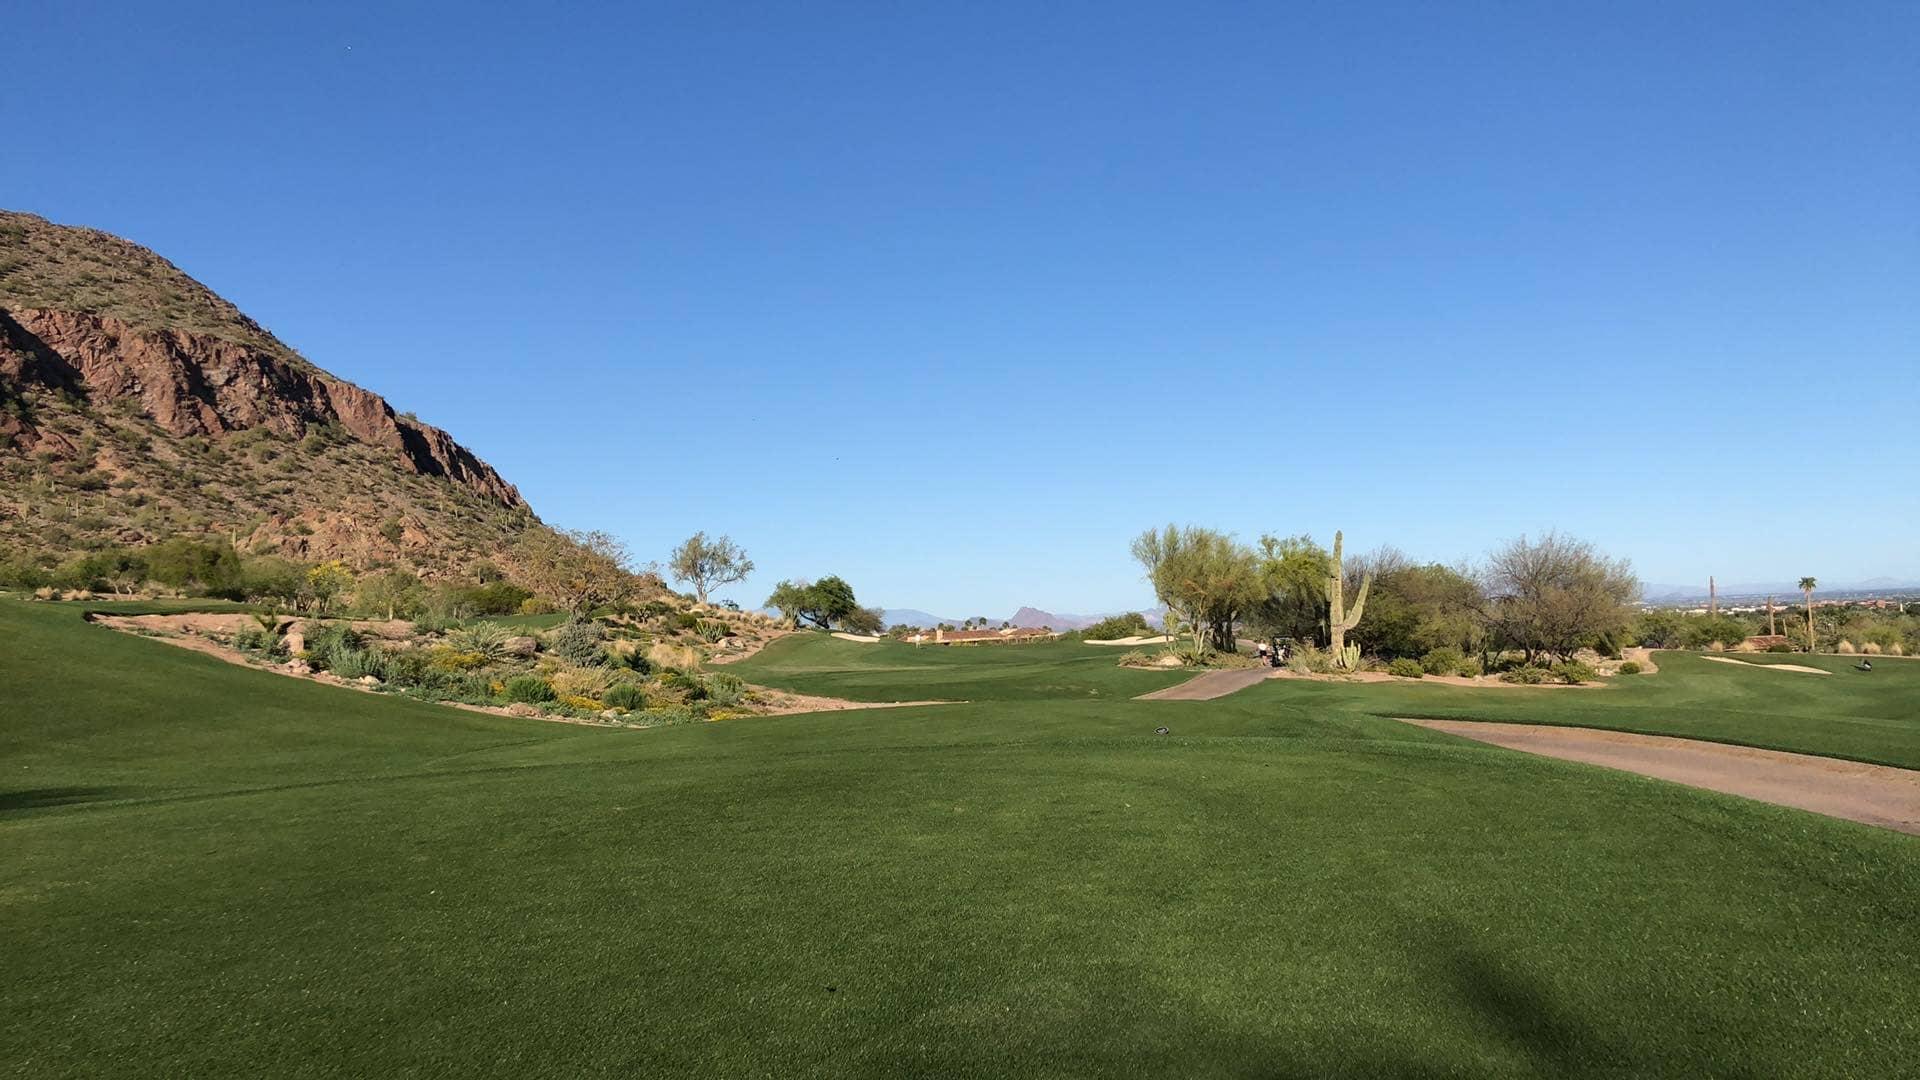 Rent Golf Clubs in Phoenix | Rent Golf Clubs in Scottsdale